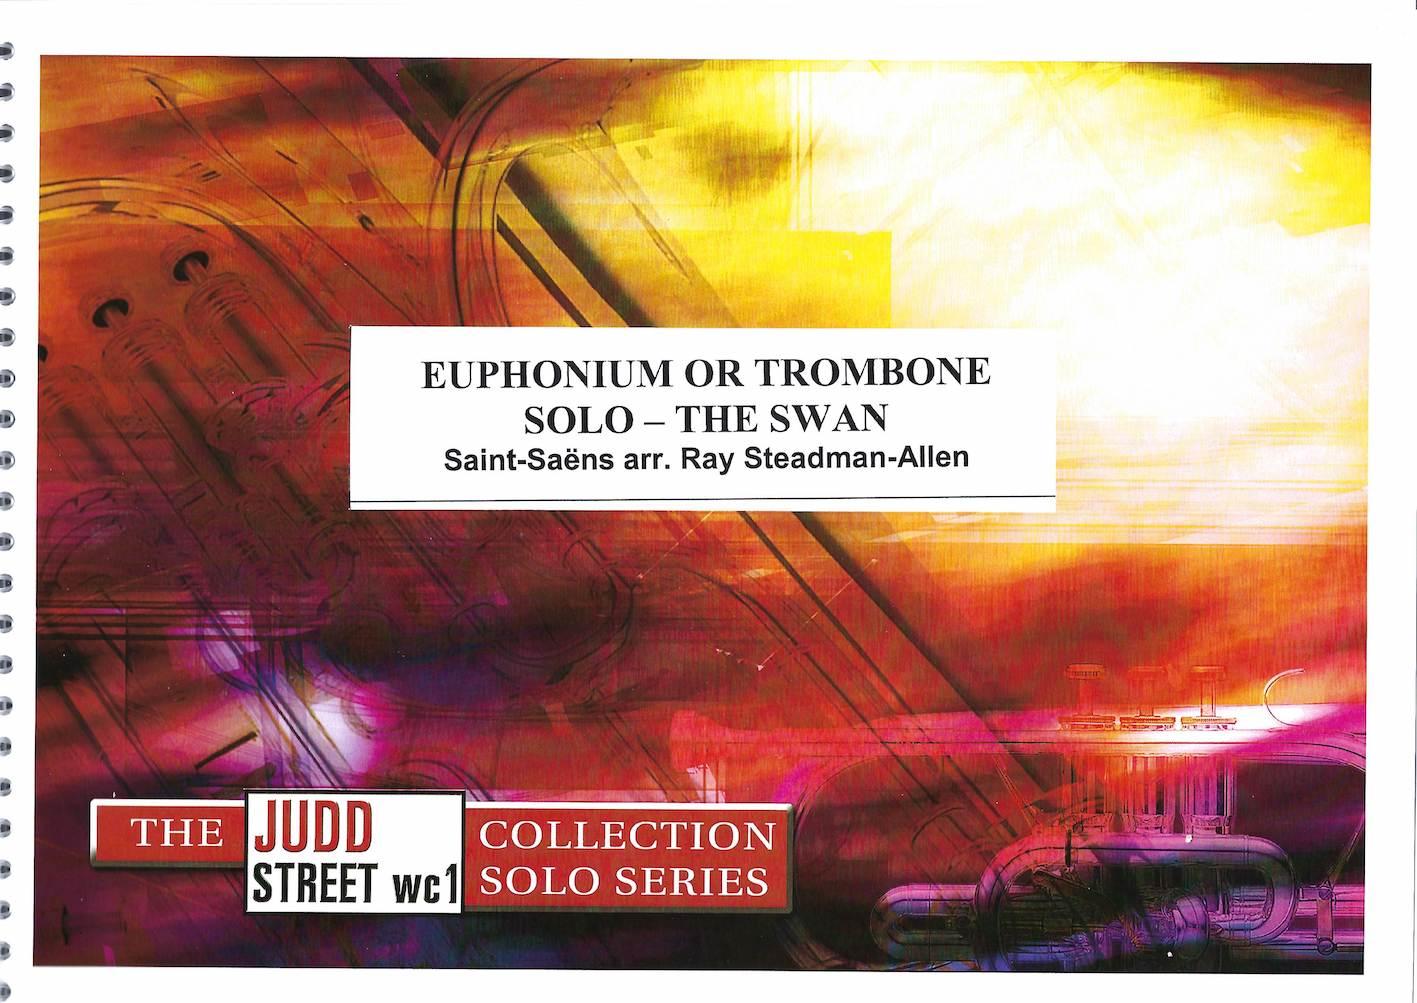 The Swan - Saint-Saens Arr. Ray Steadman-Allen - Euphonium and Brass Band